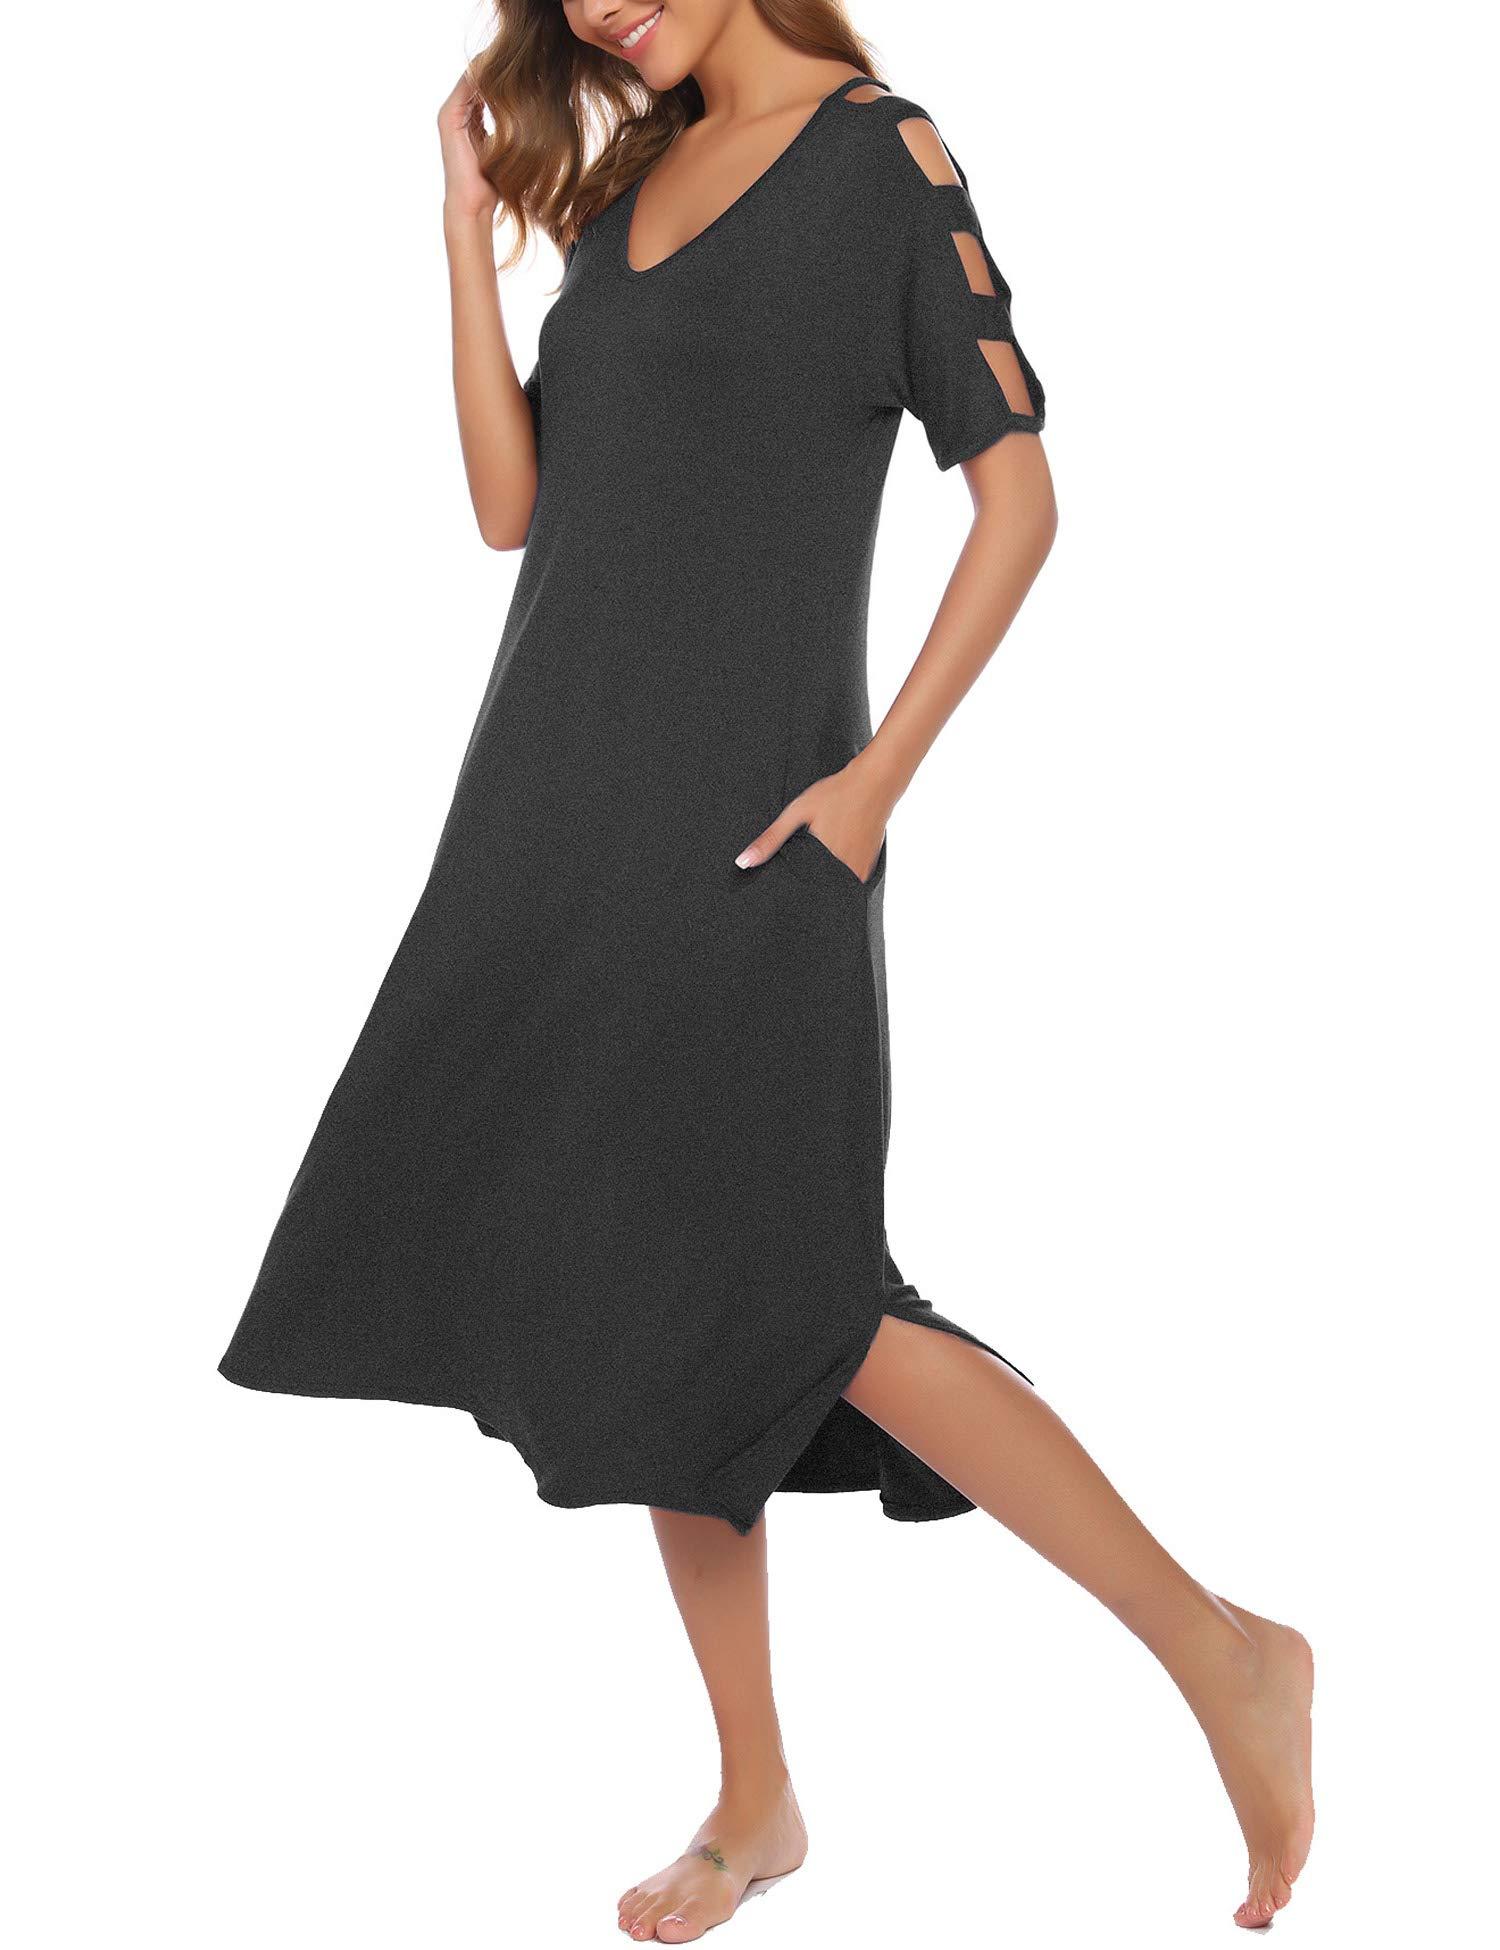 Bloggerlove Loungewear Women's Nightgown Short Sleeve Sleepshirt V-Neck Sleepwear Plus Size Sleep Dress